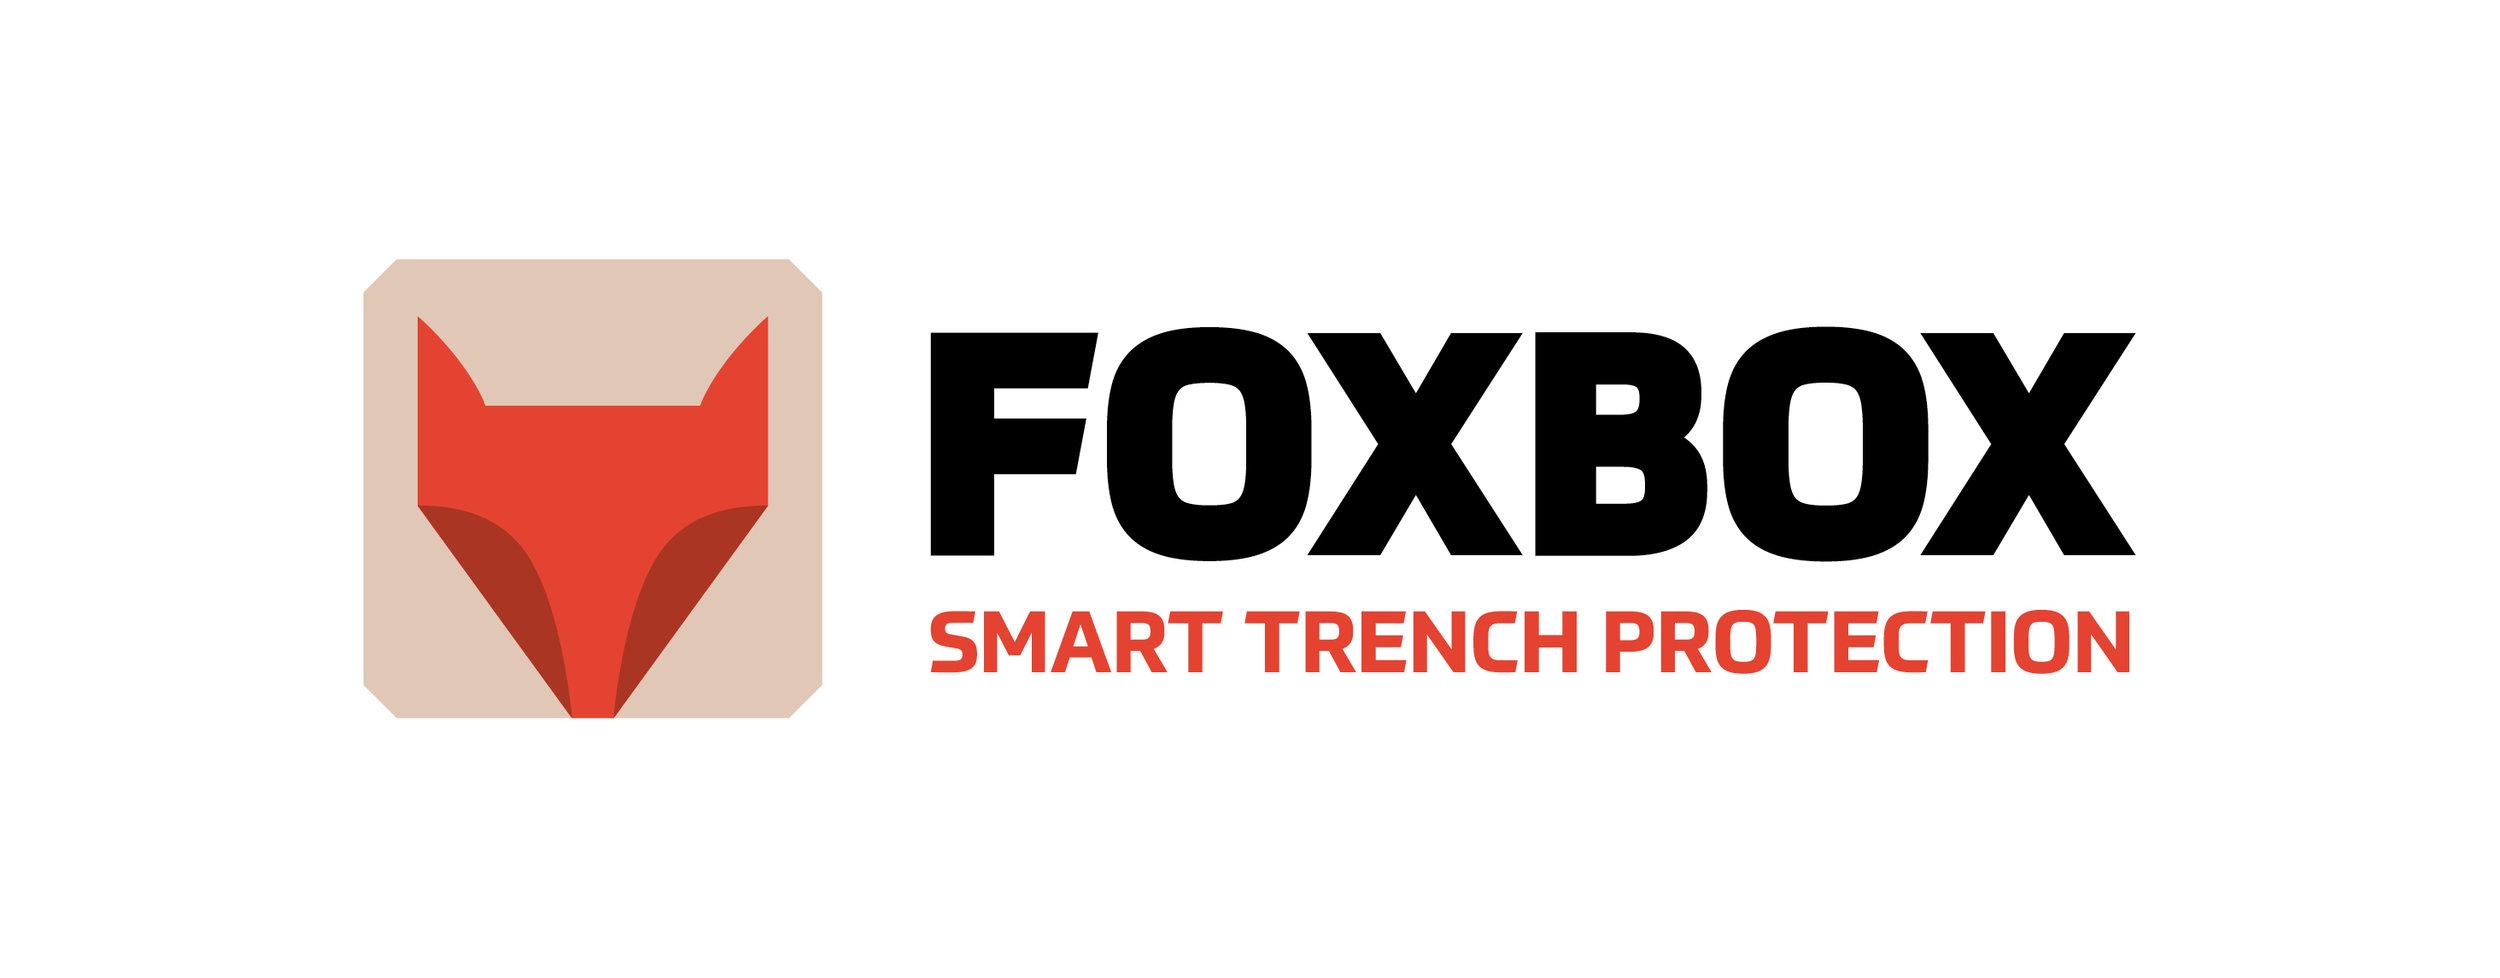 Foxbox Logo_Crop.jpg